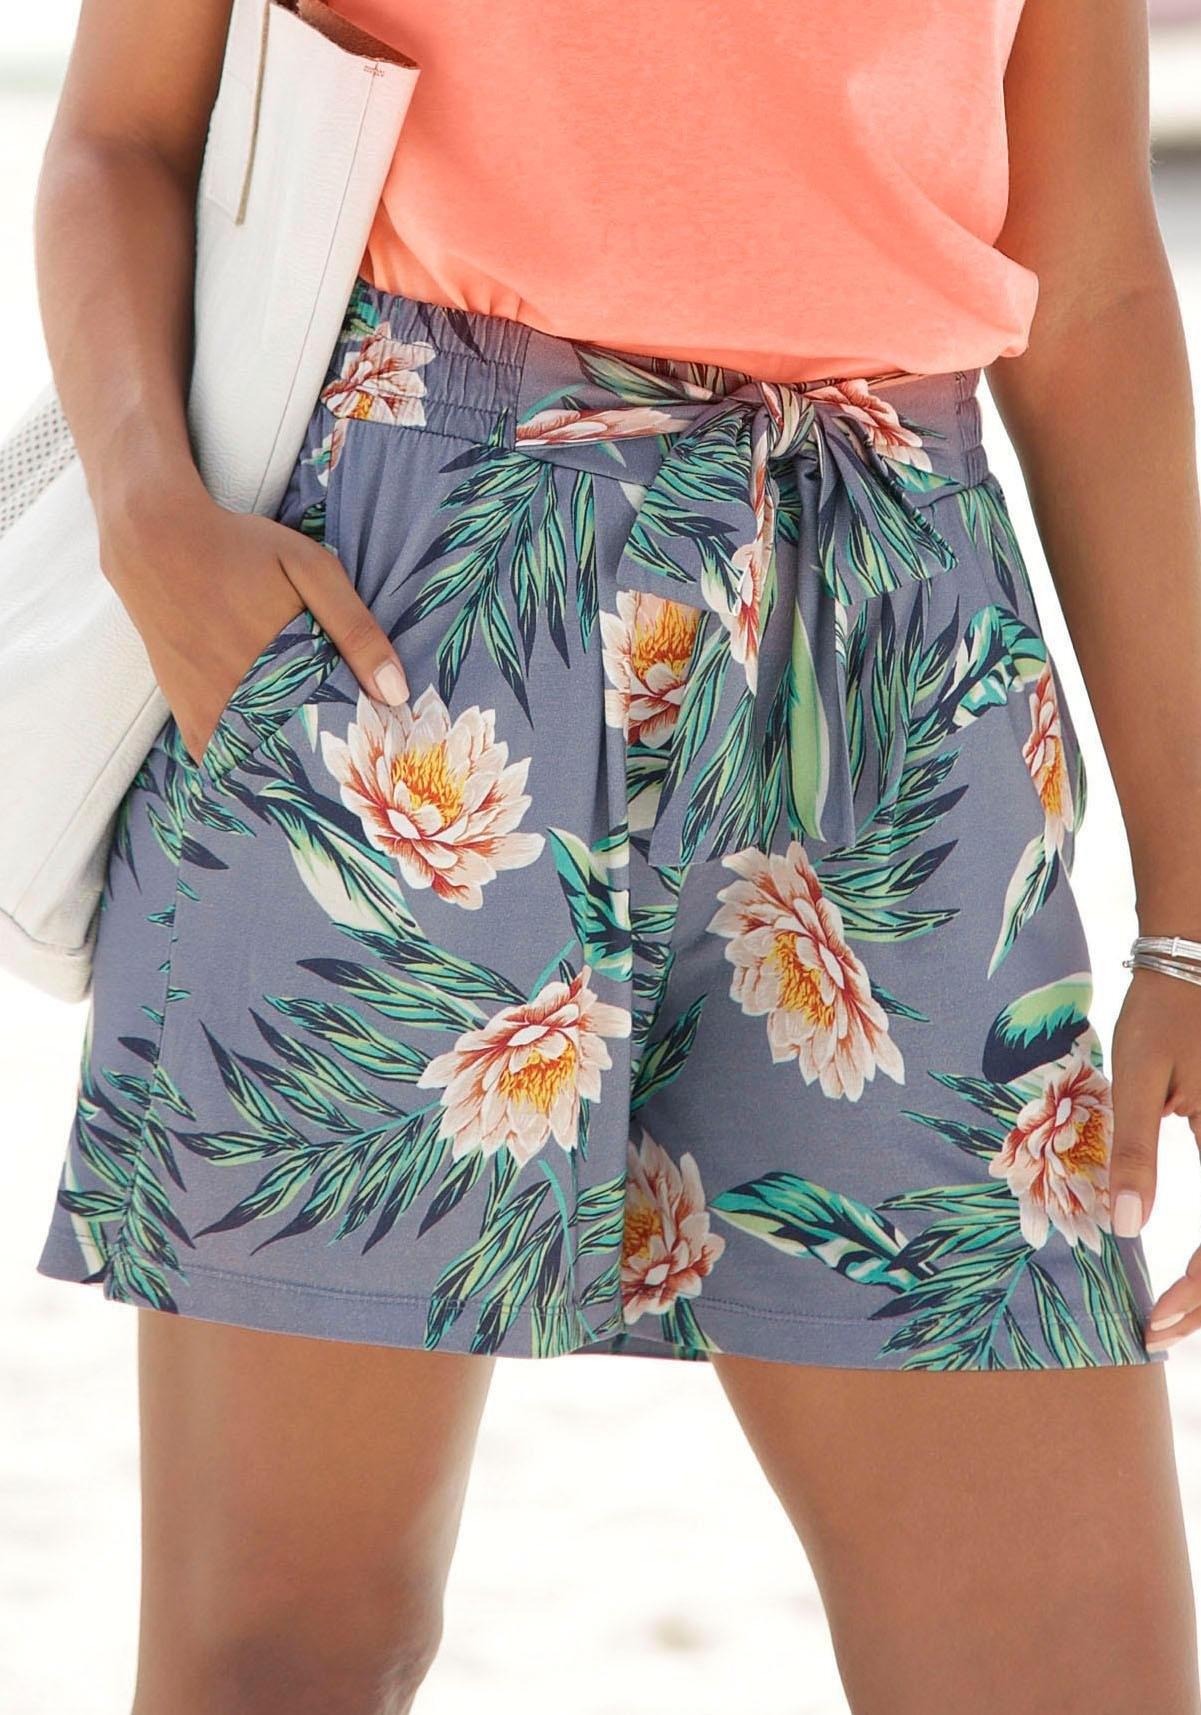 s.Oliver Beachwear strandshort - gratis ruilen op lascana.nl